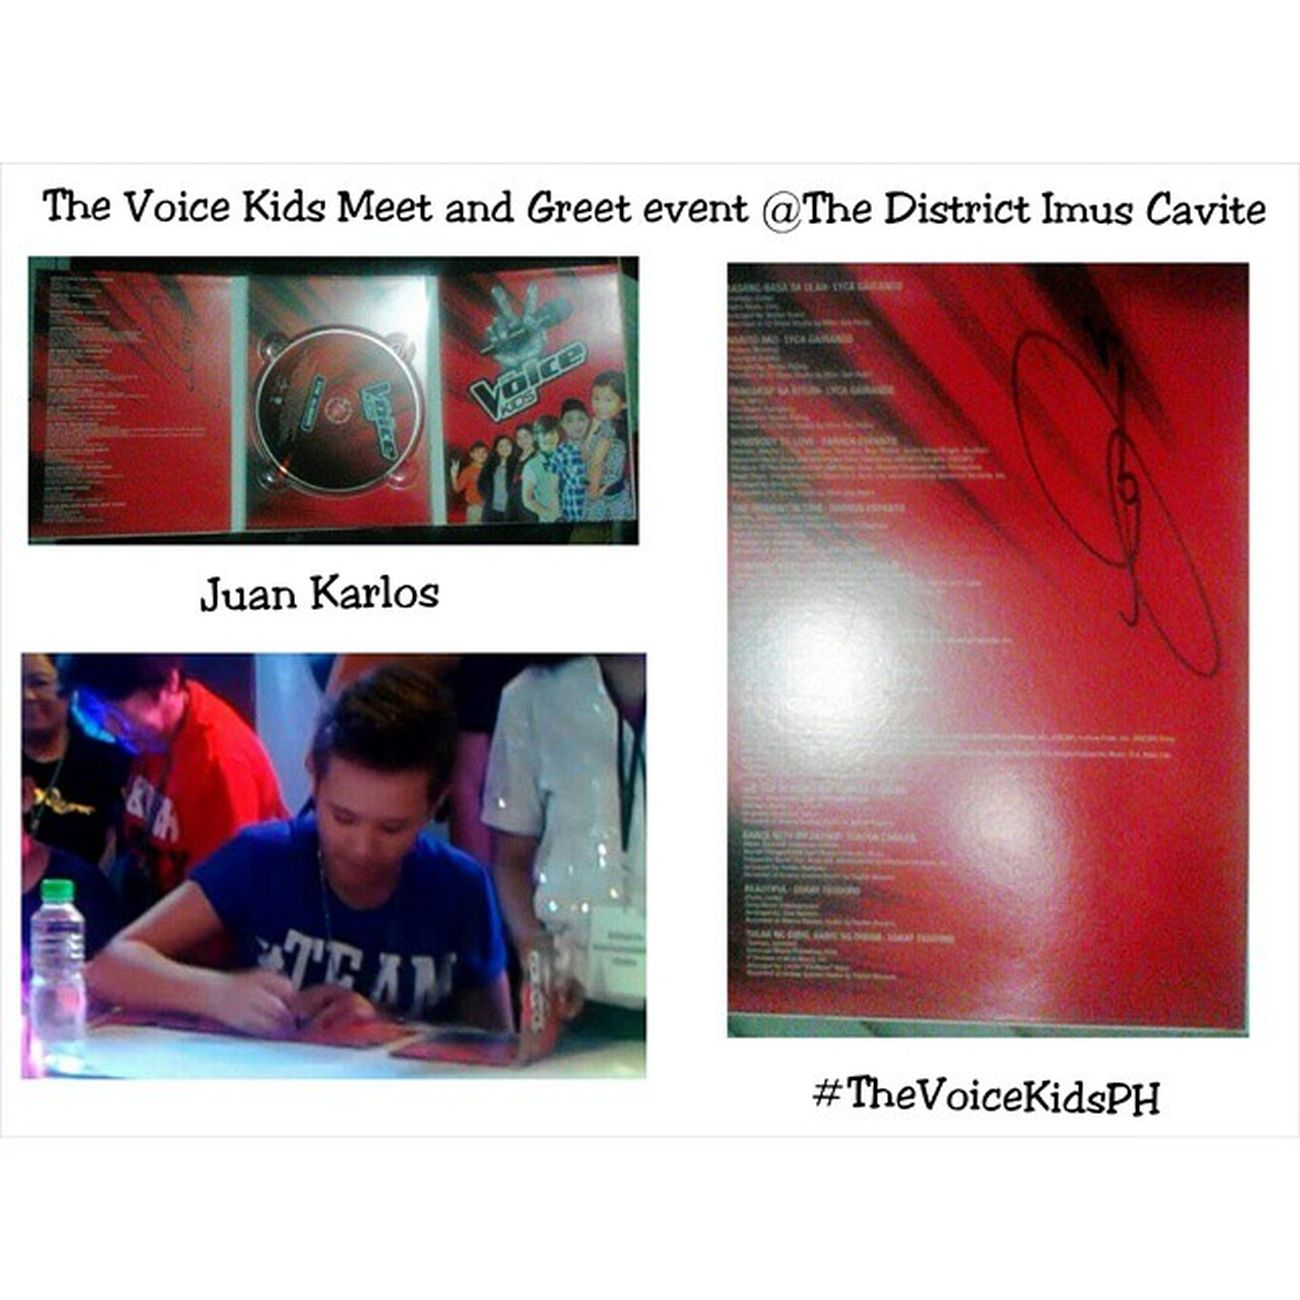 Juan Karlos (JK) salamat sa autograph idol :) TheVoiceKidsPH MeetAndGreet TheDistrictImusCavite